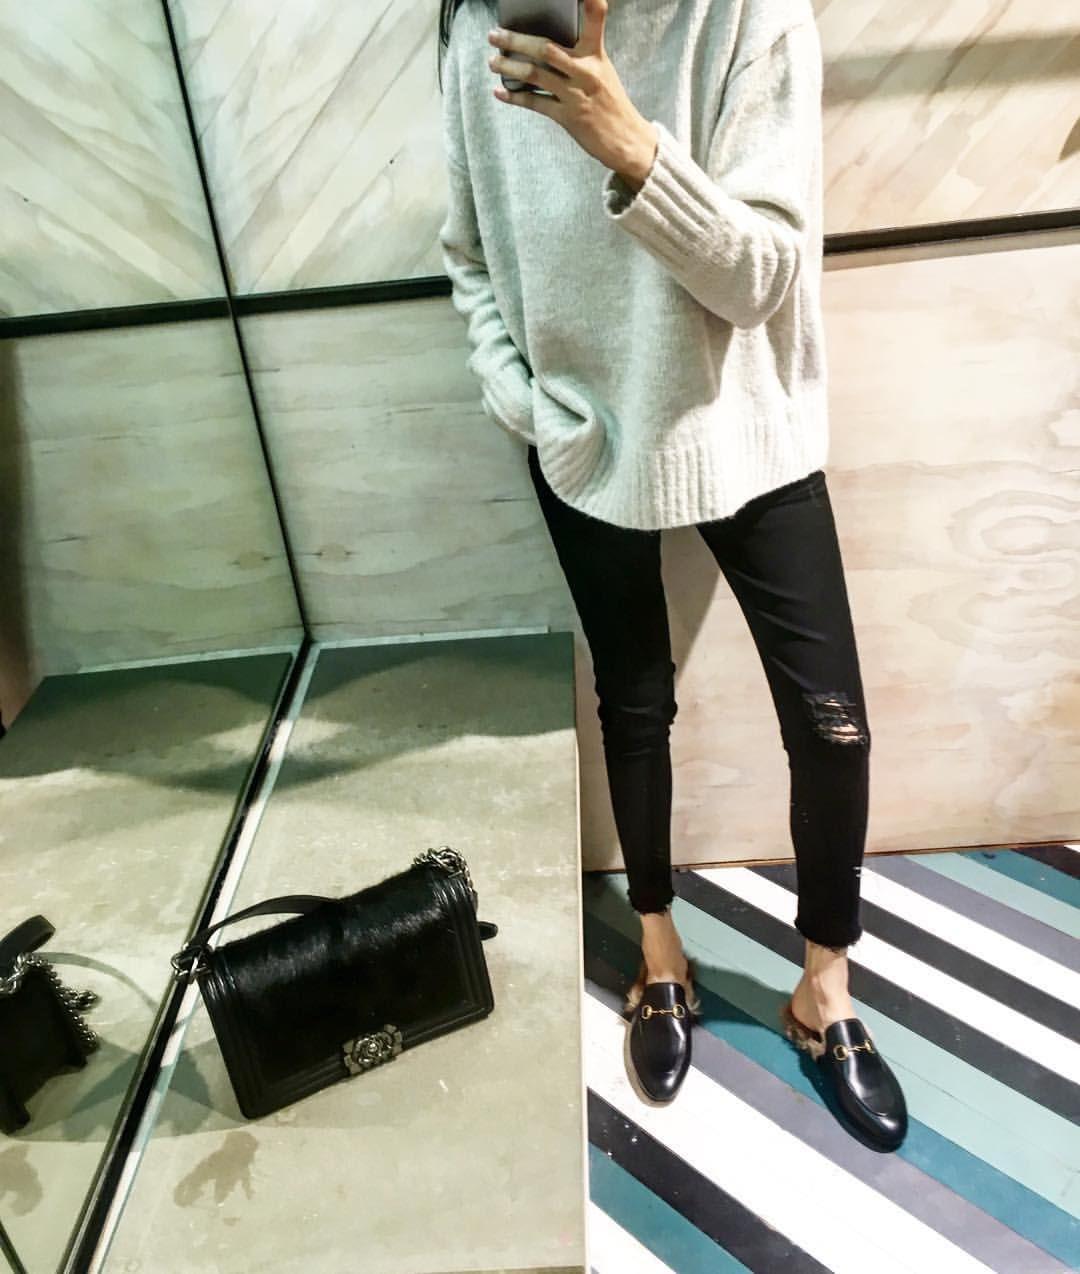 f998f593ff8d Gucci mule shoes | W E △ R | Fashion, Autumn fashion, Outfits